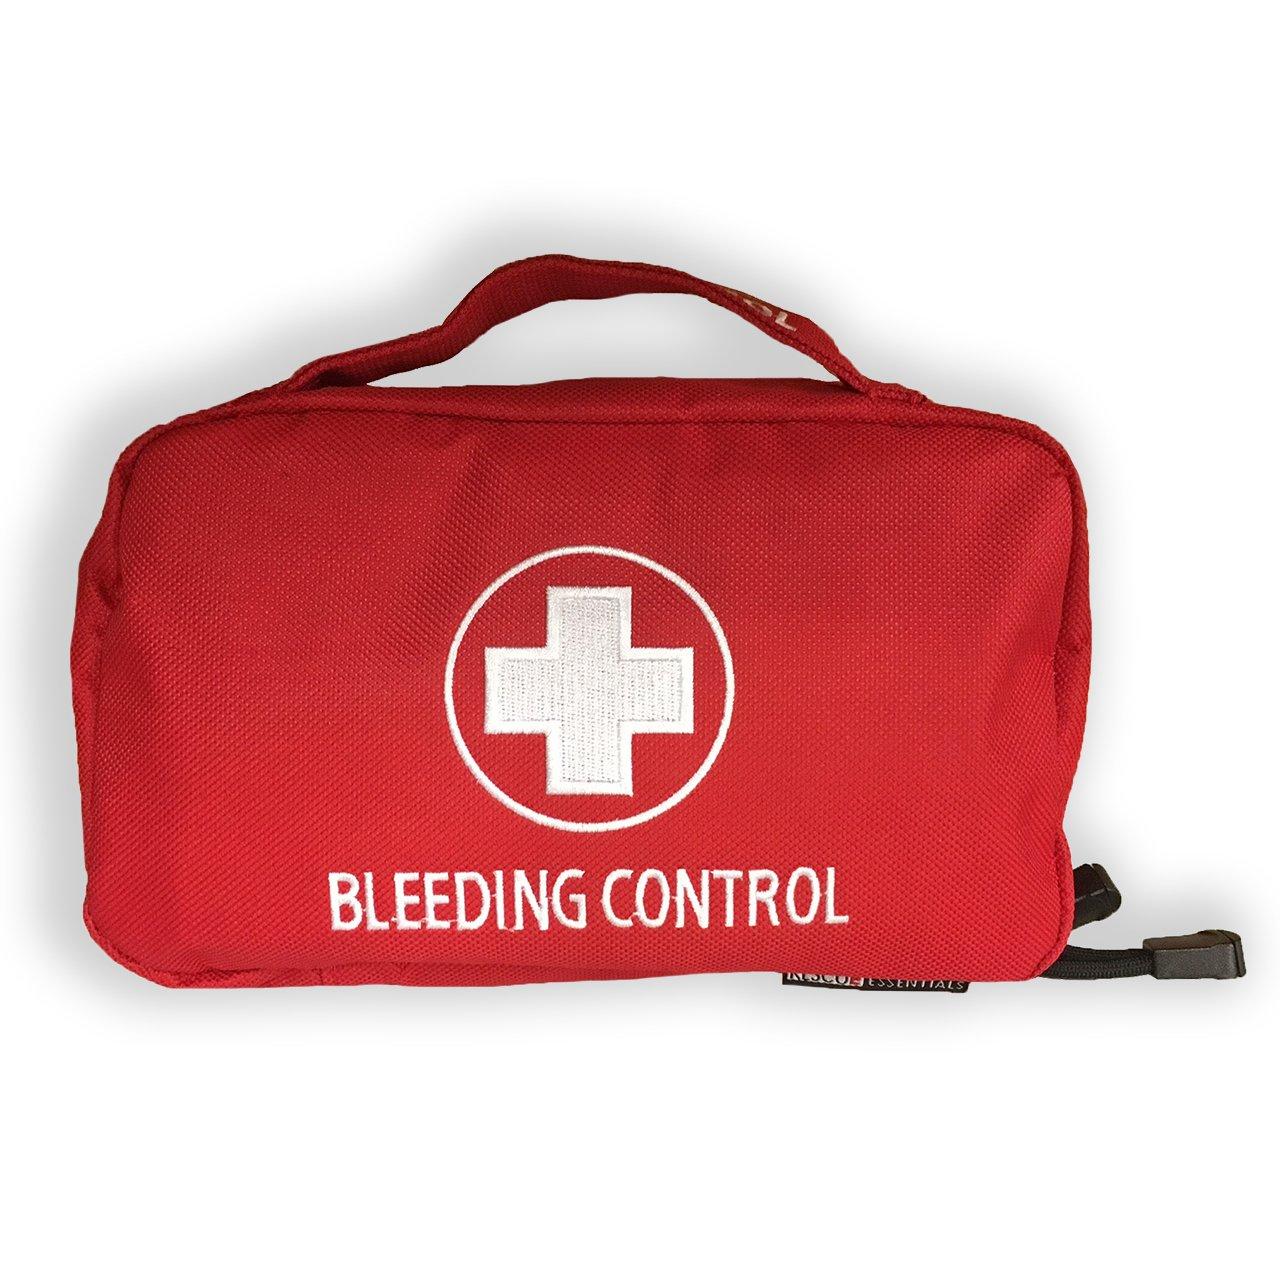 Rescue Essentials Bleeding Control Public Access Nylon Kit - Double